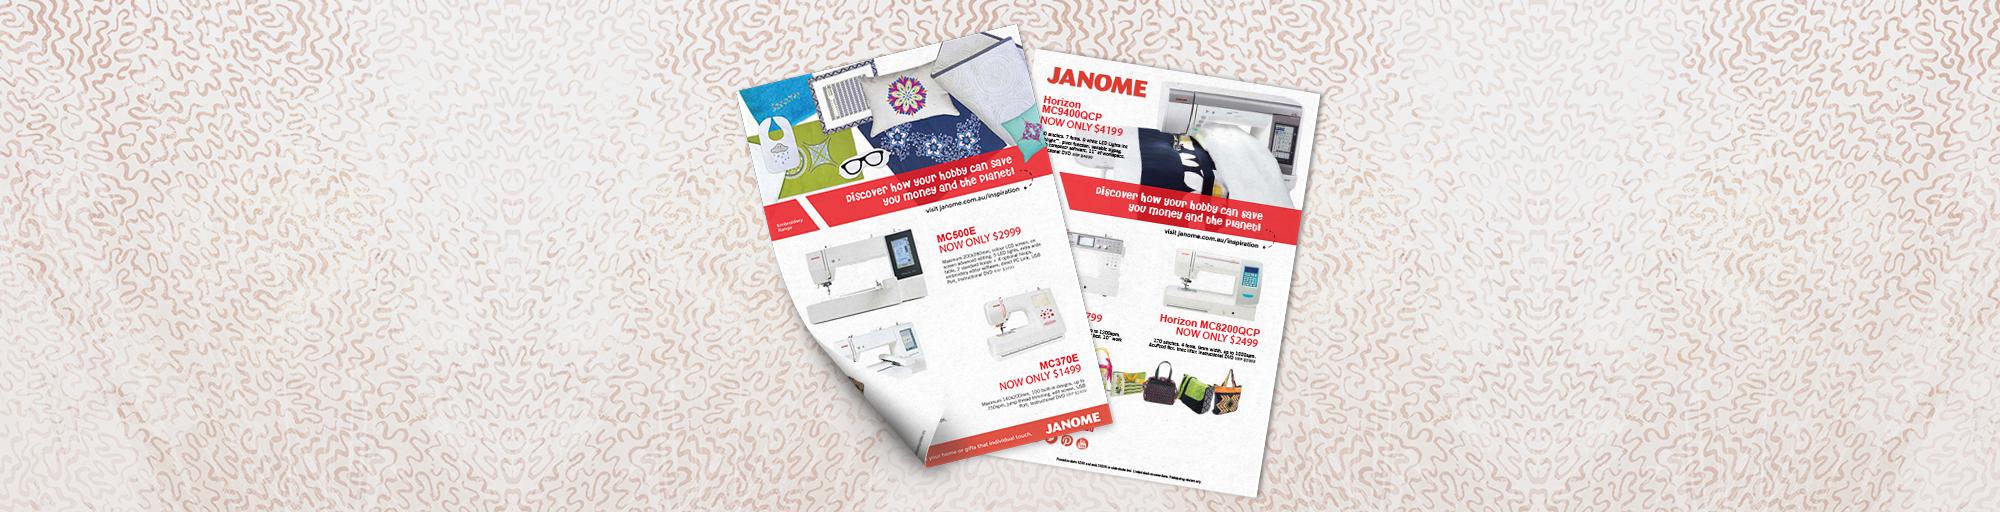 Janome Instore Mailer FebMar Blog Banner